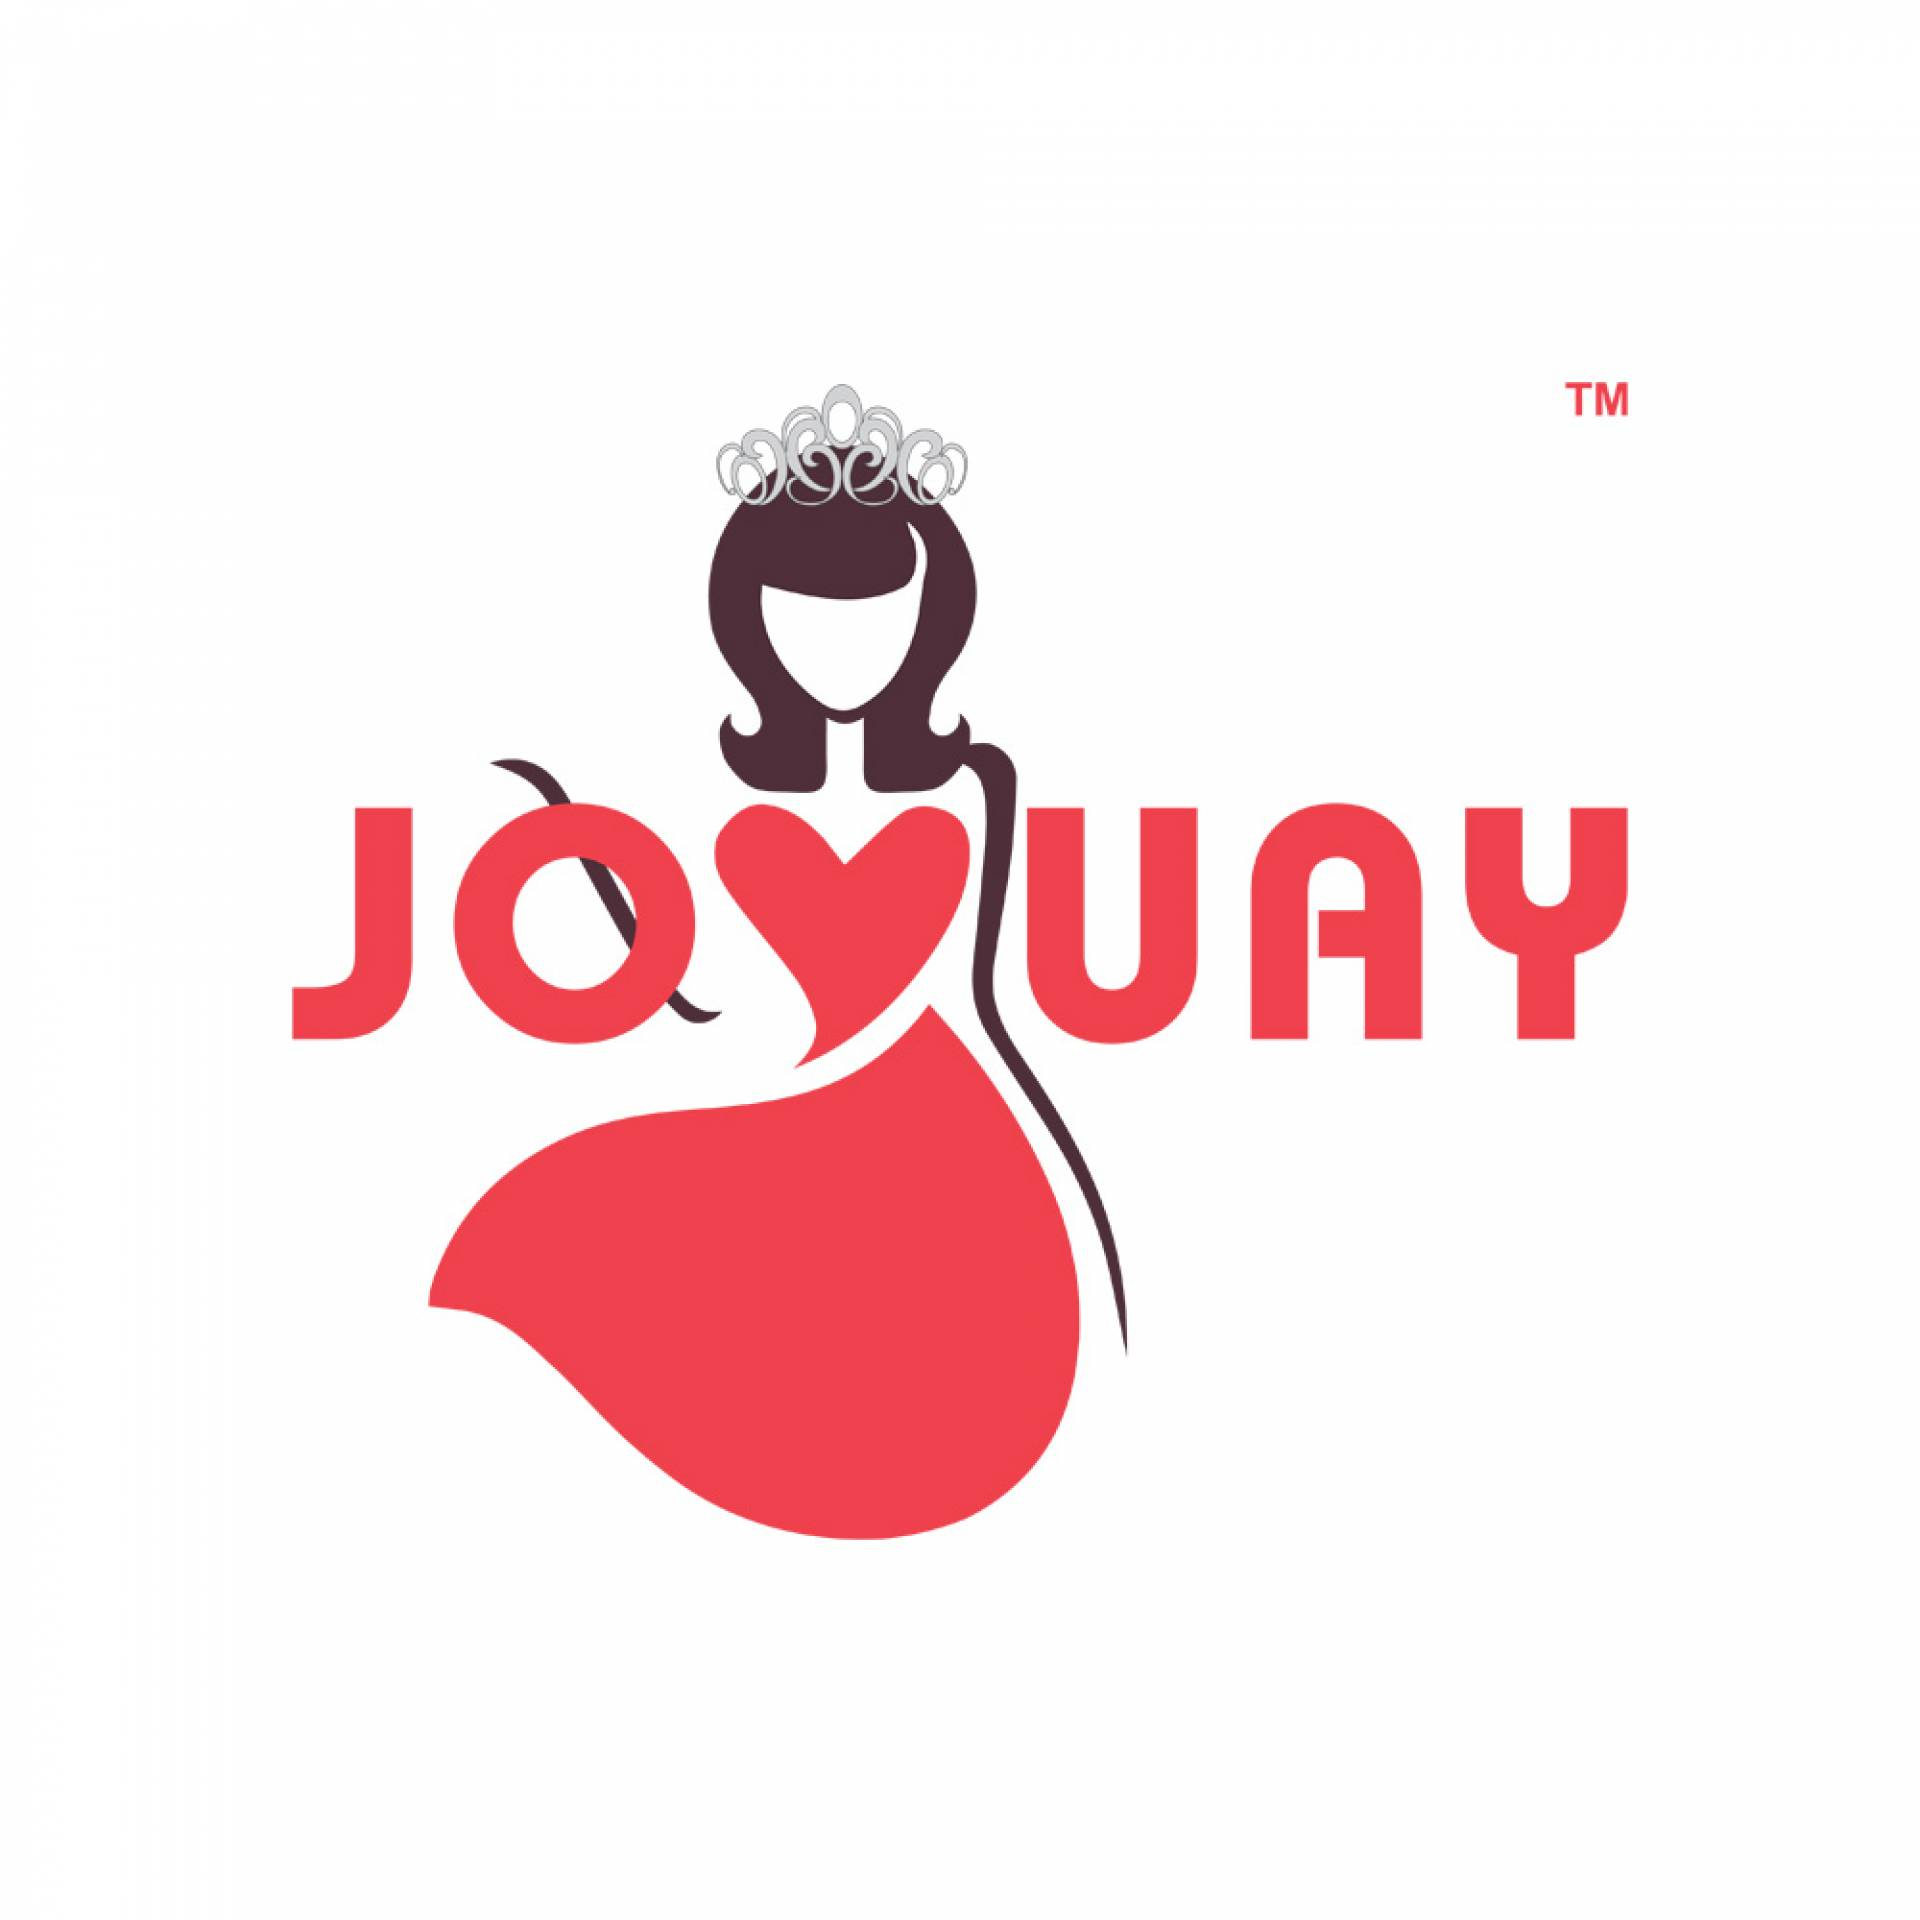 Joquay